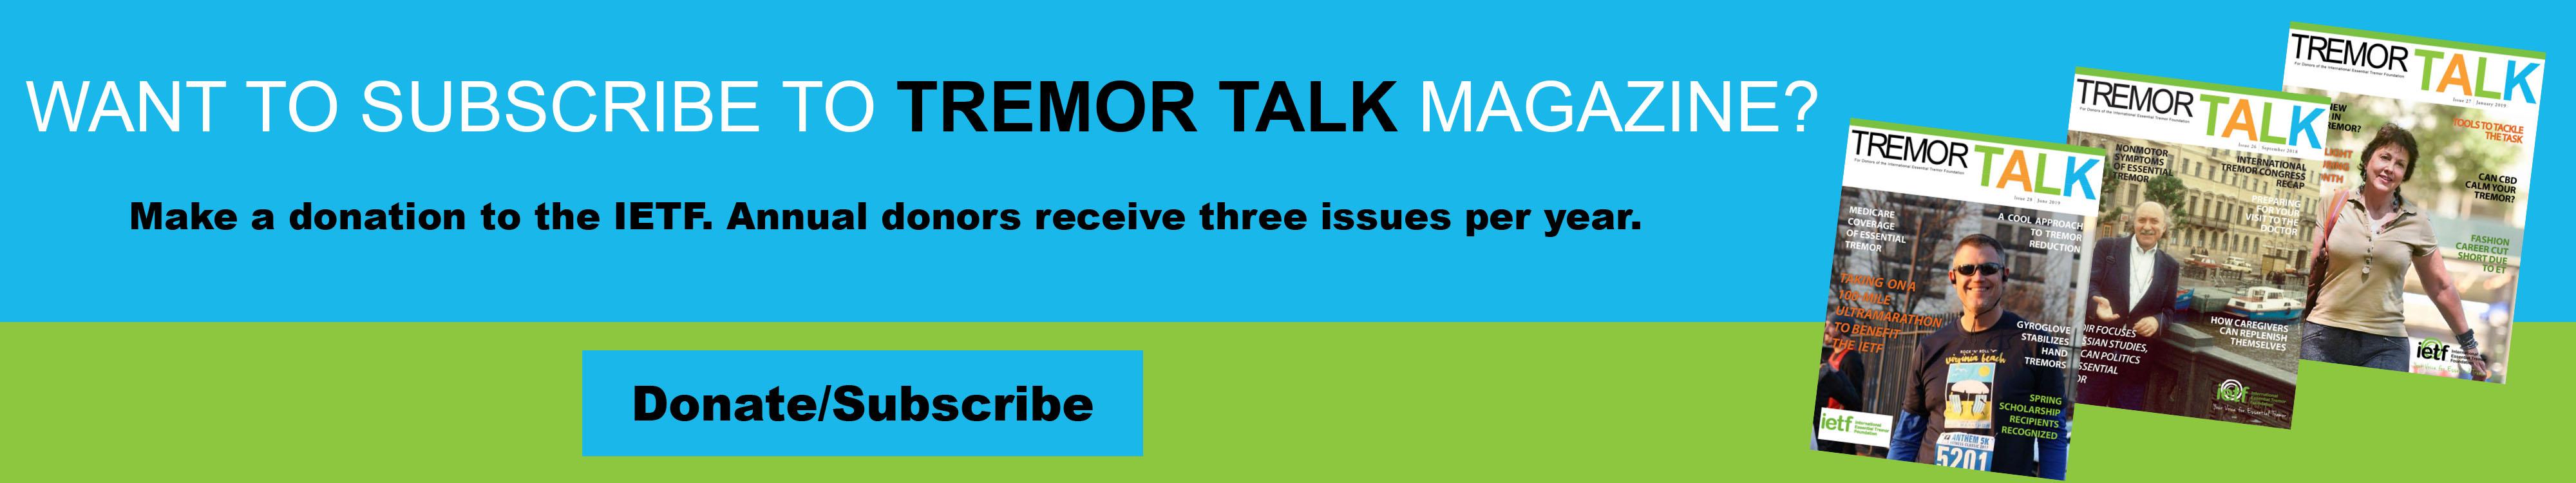 Tremor Talk Magazine Subscription